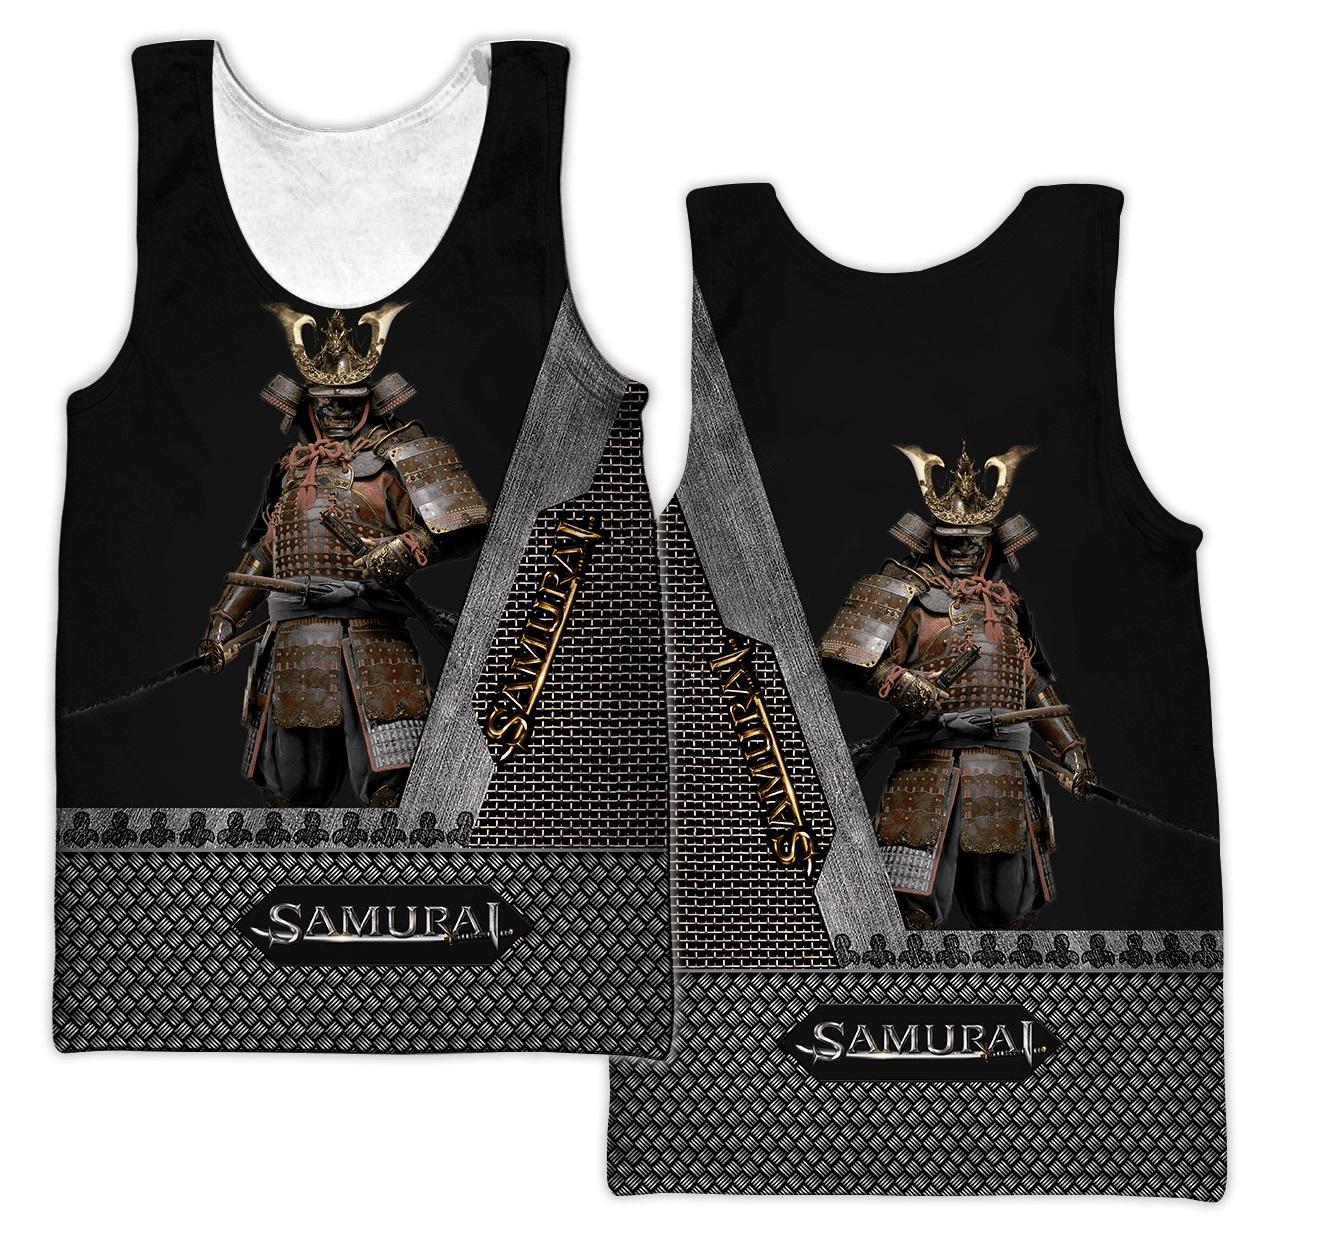 Samurai all over printed tank top